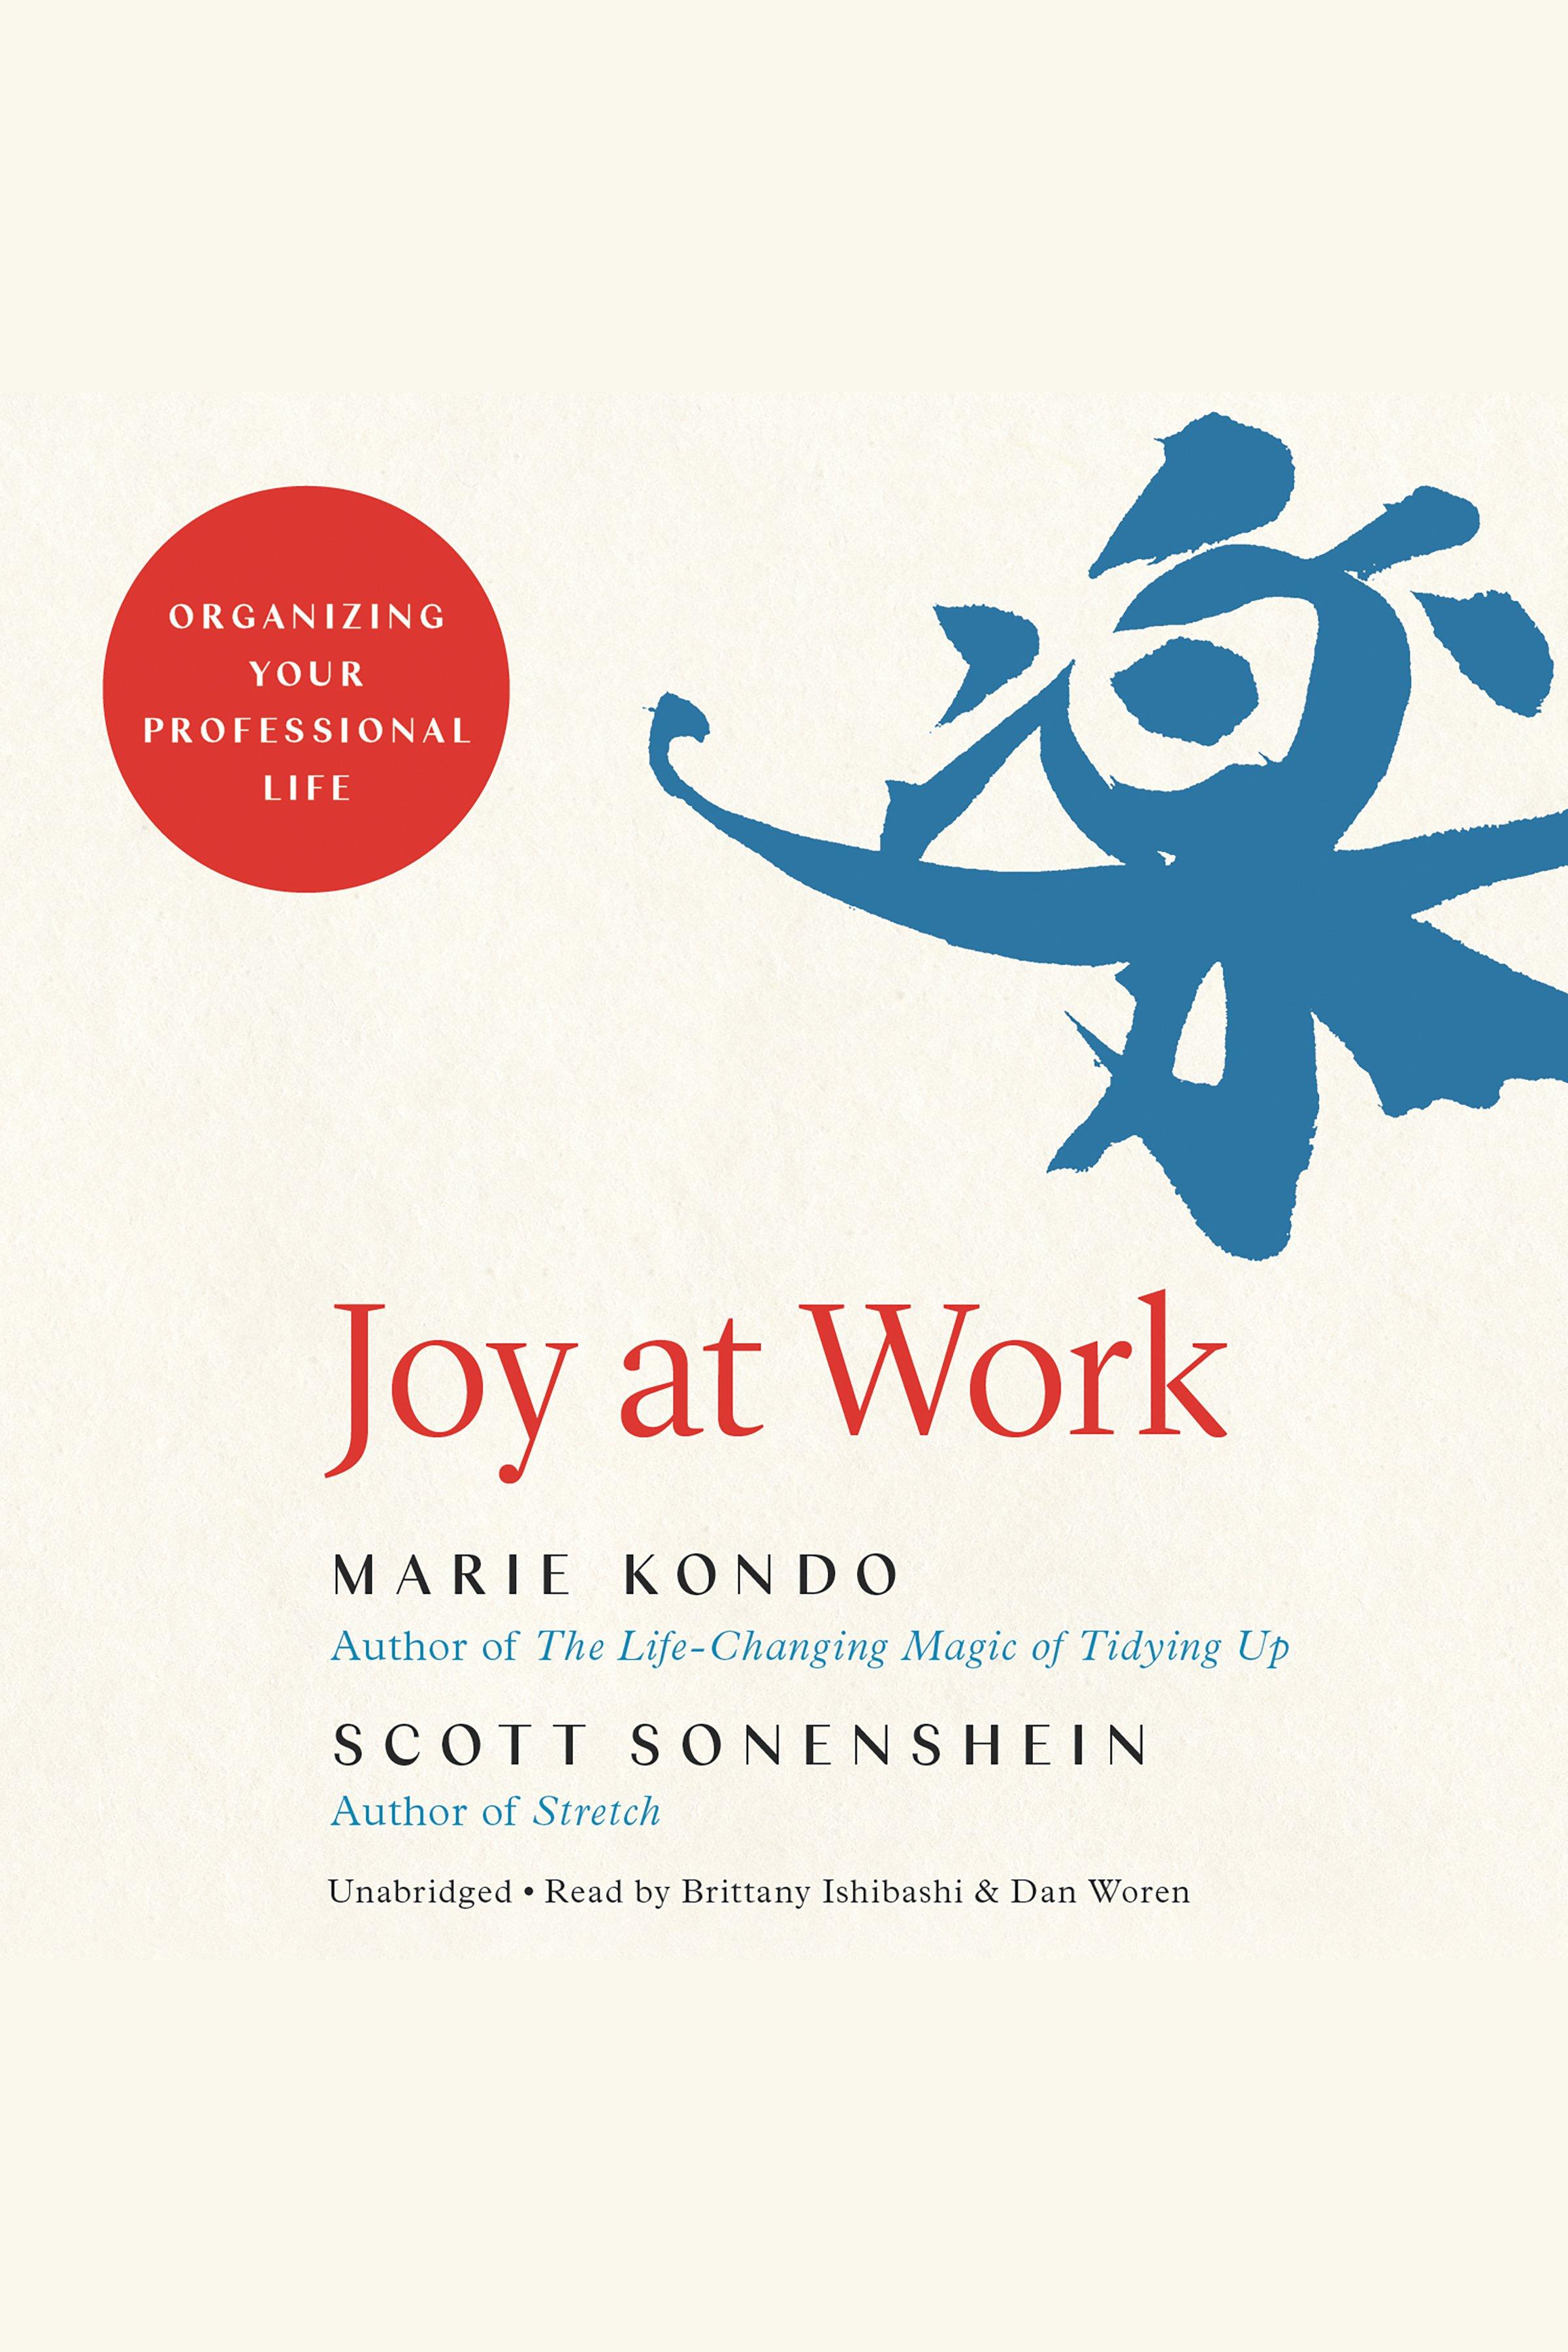 Joy at Work Organizing Your Professional Life